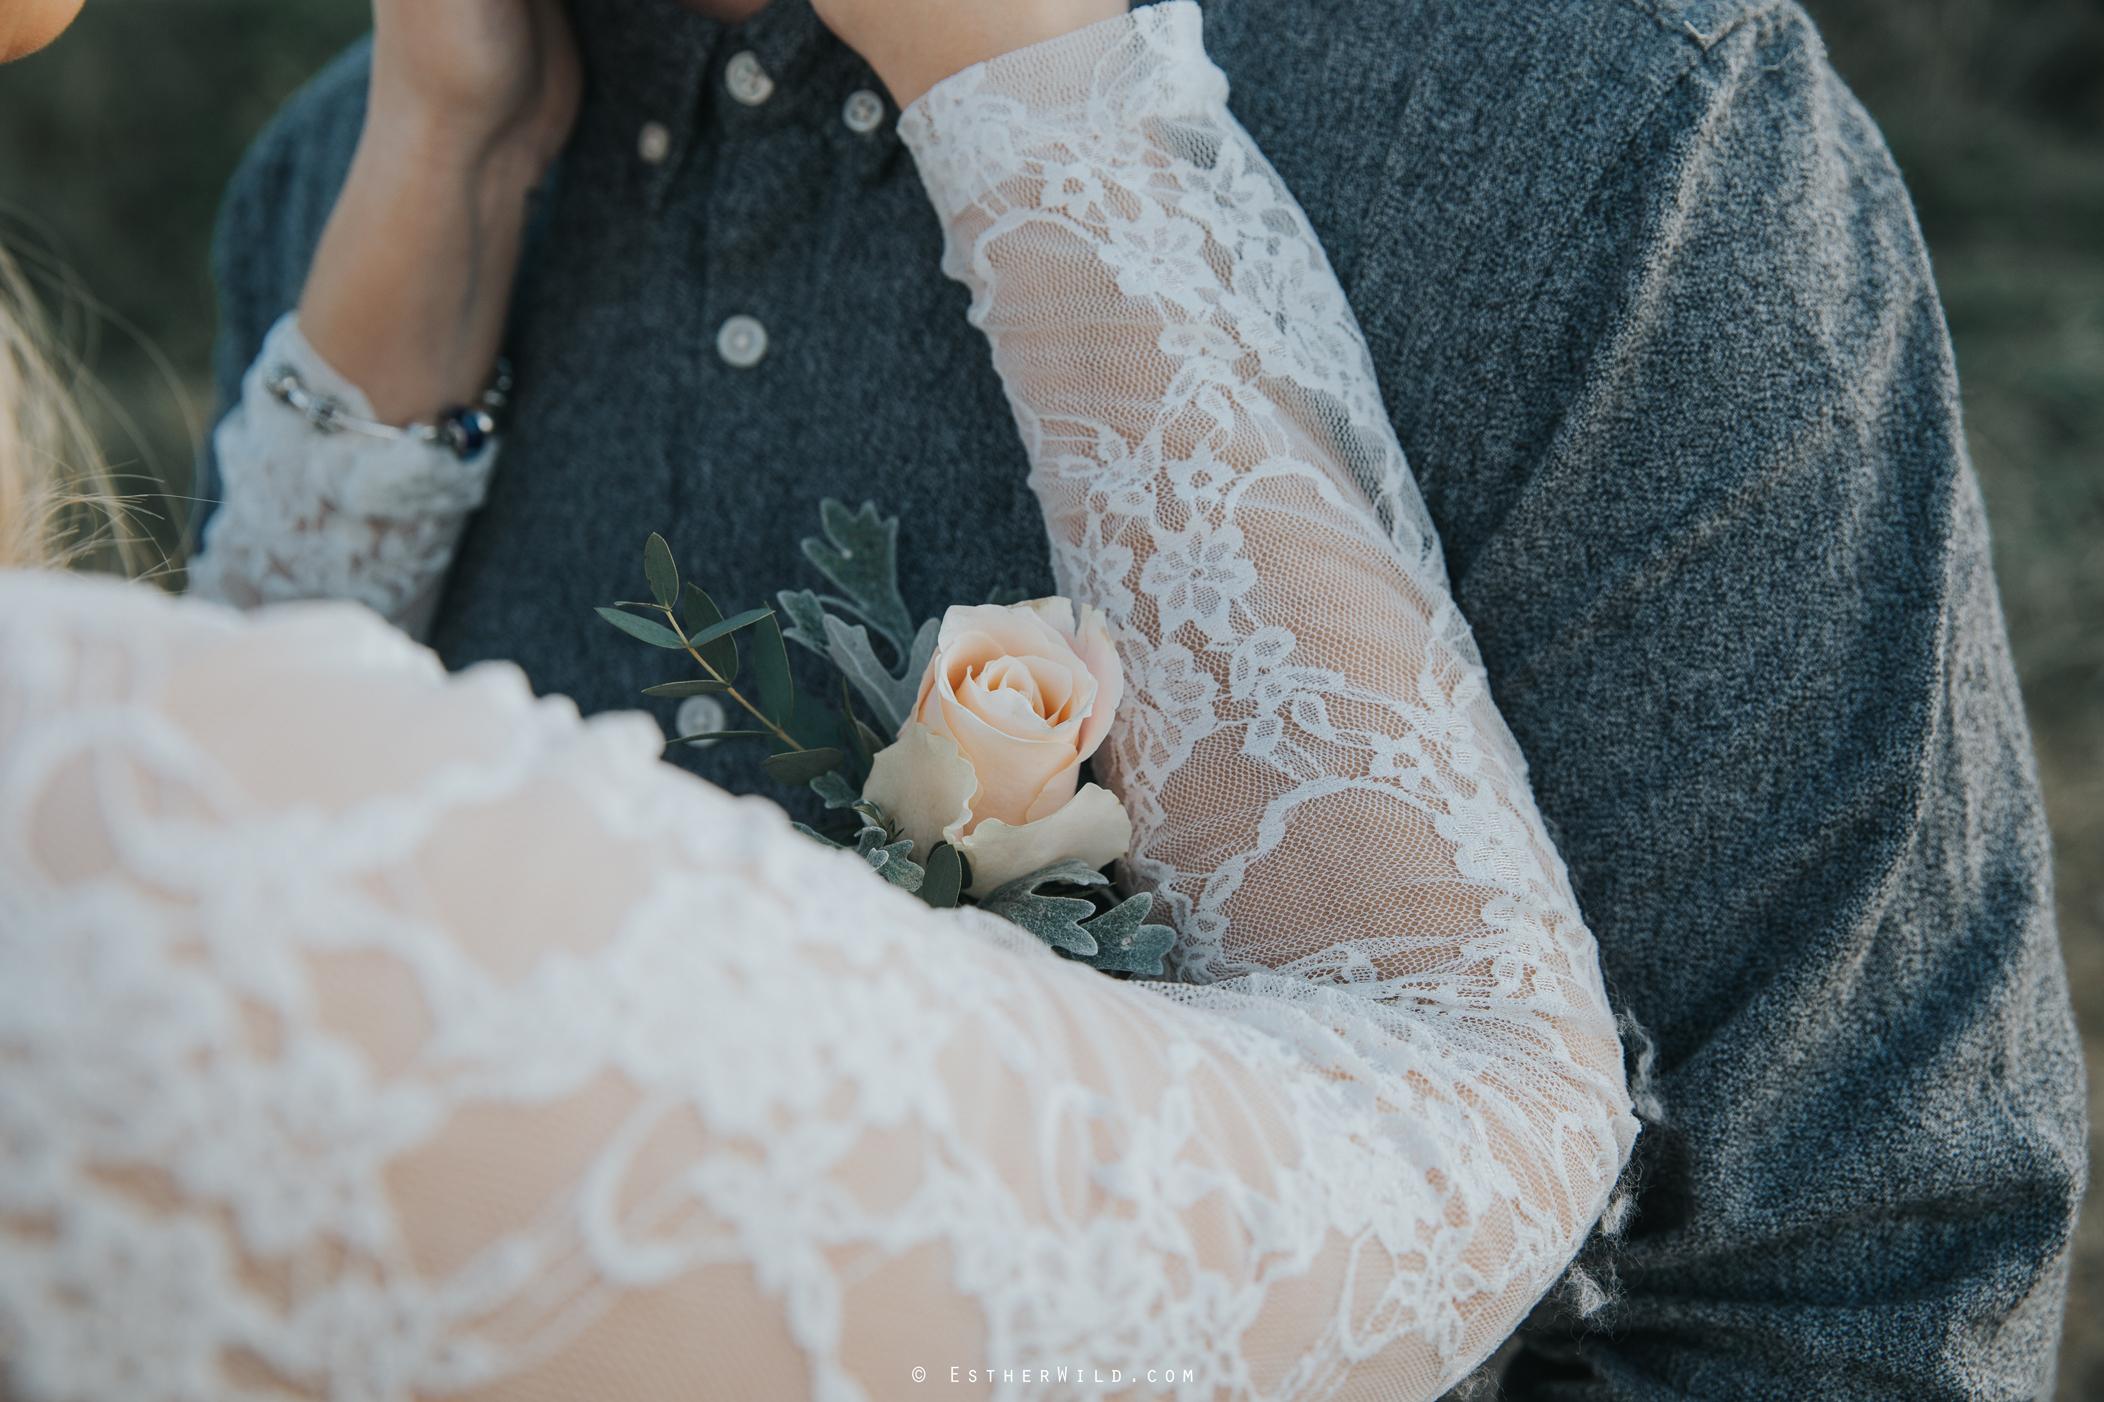 Couple_Anniversary_Wedding_Photography_Hunstanton_Norfolk_Esther_Wild_Share_Copy_IMG_8604.jpg